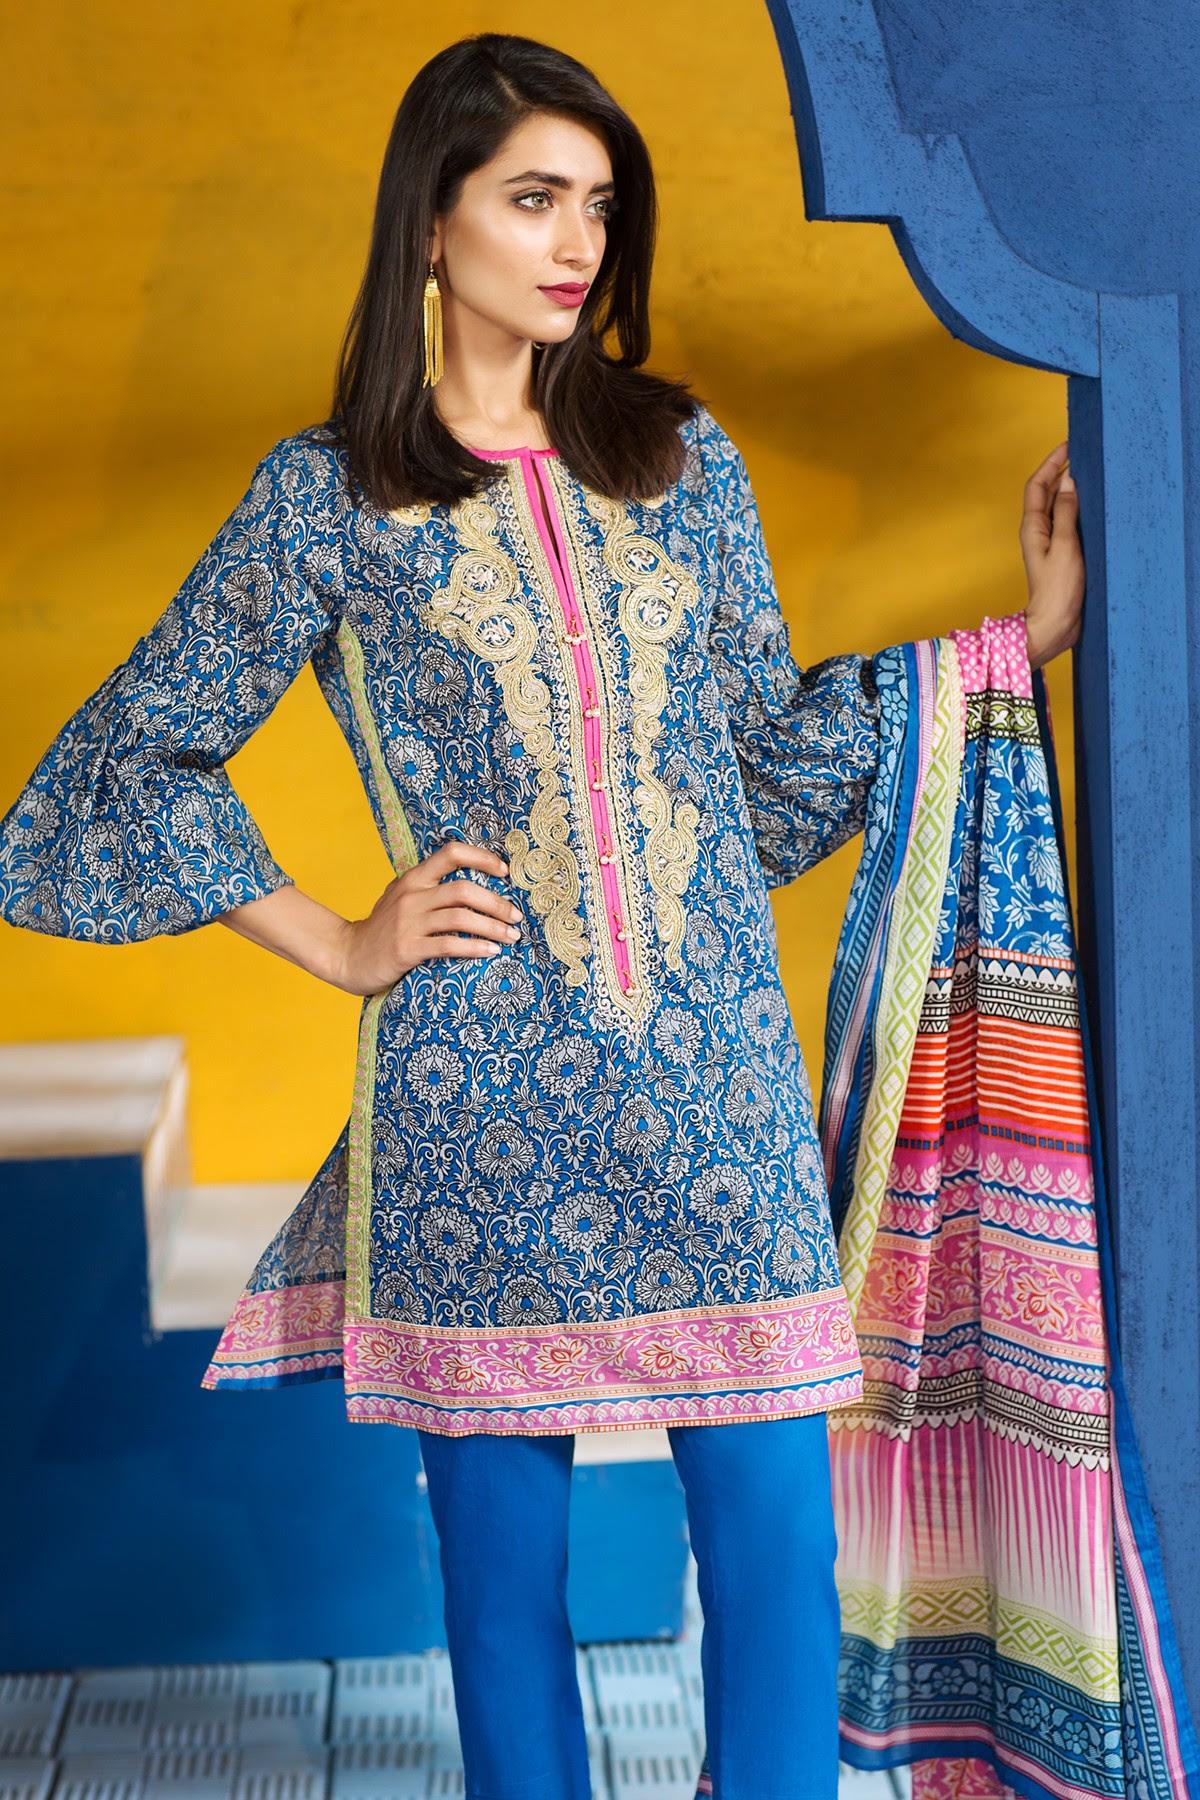 khaadi lawn chiffon eid dresses designs collection 20172018